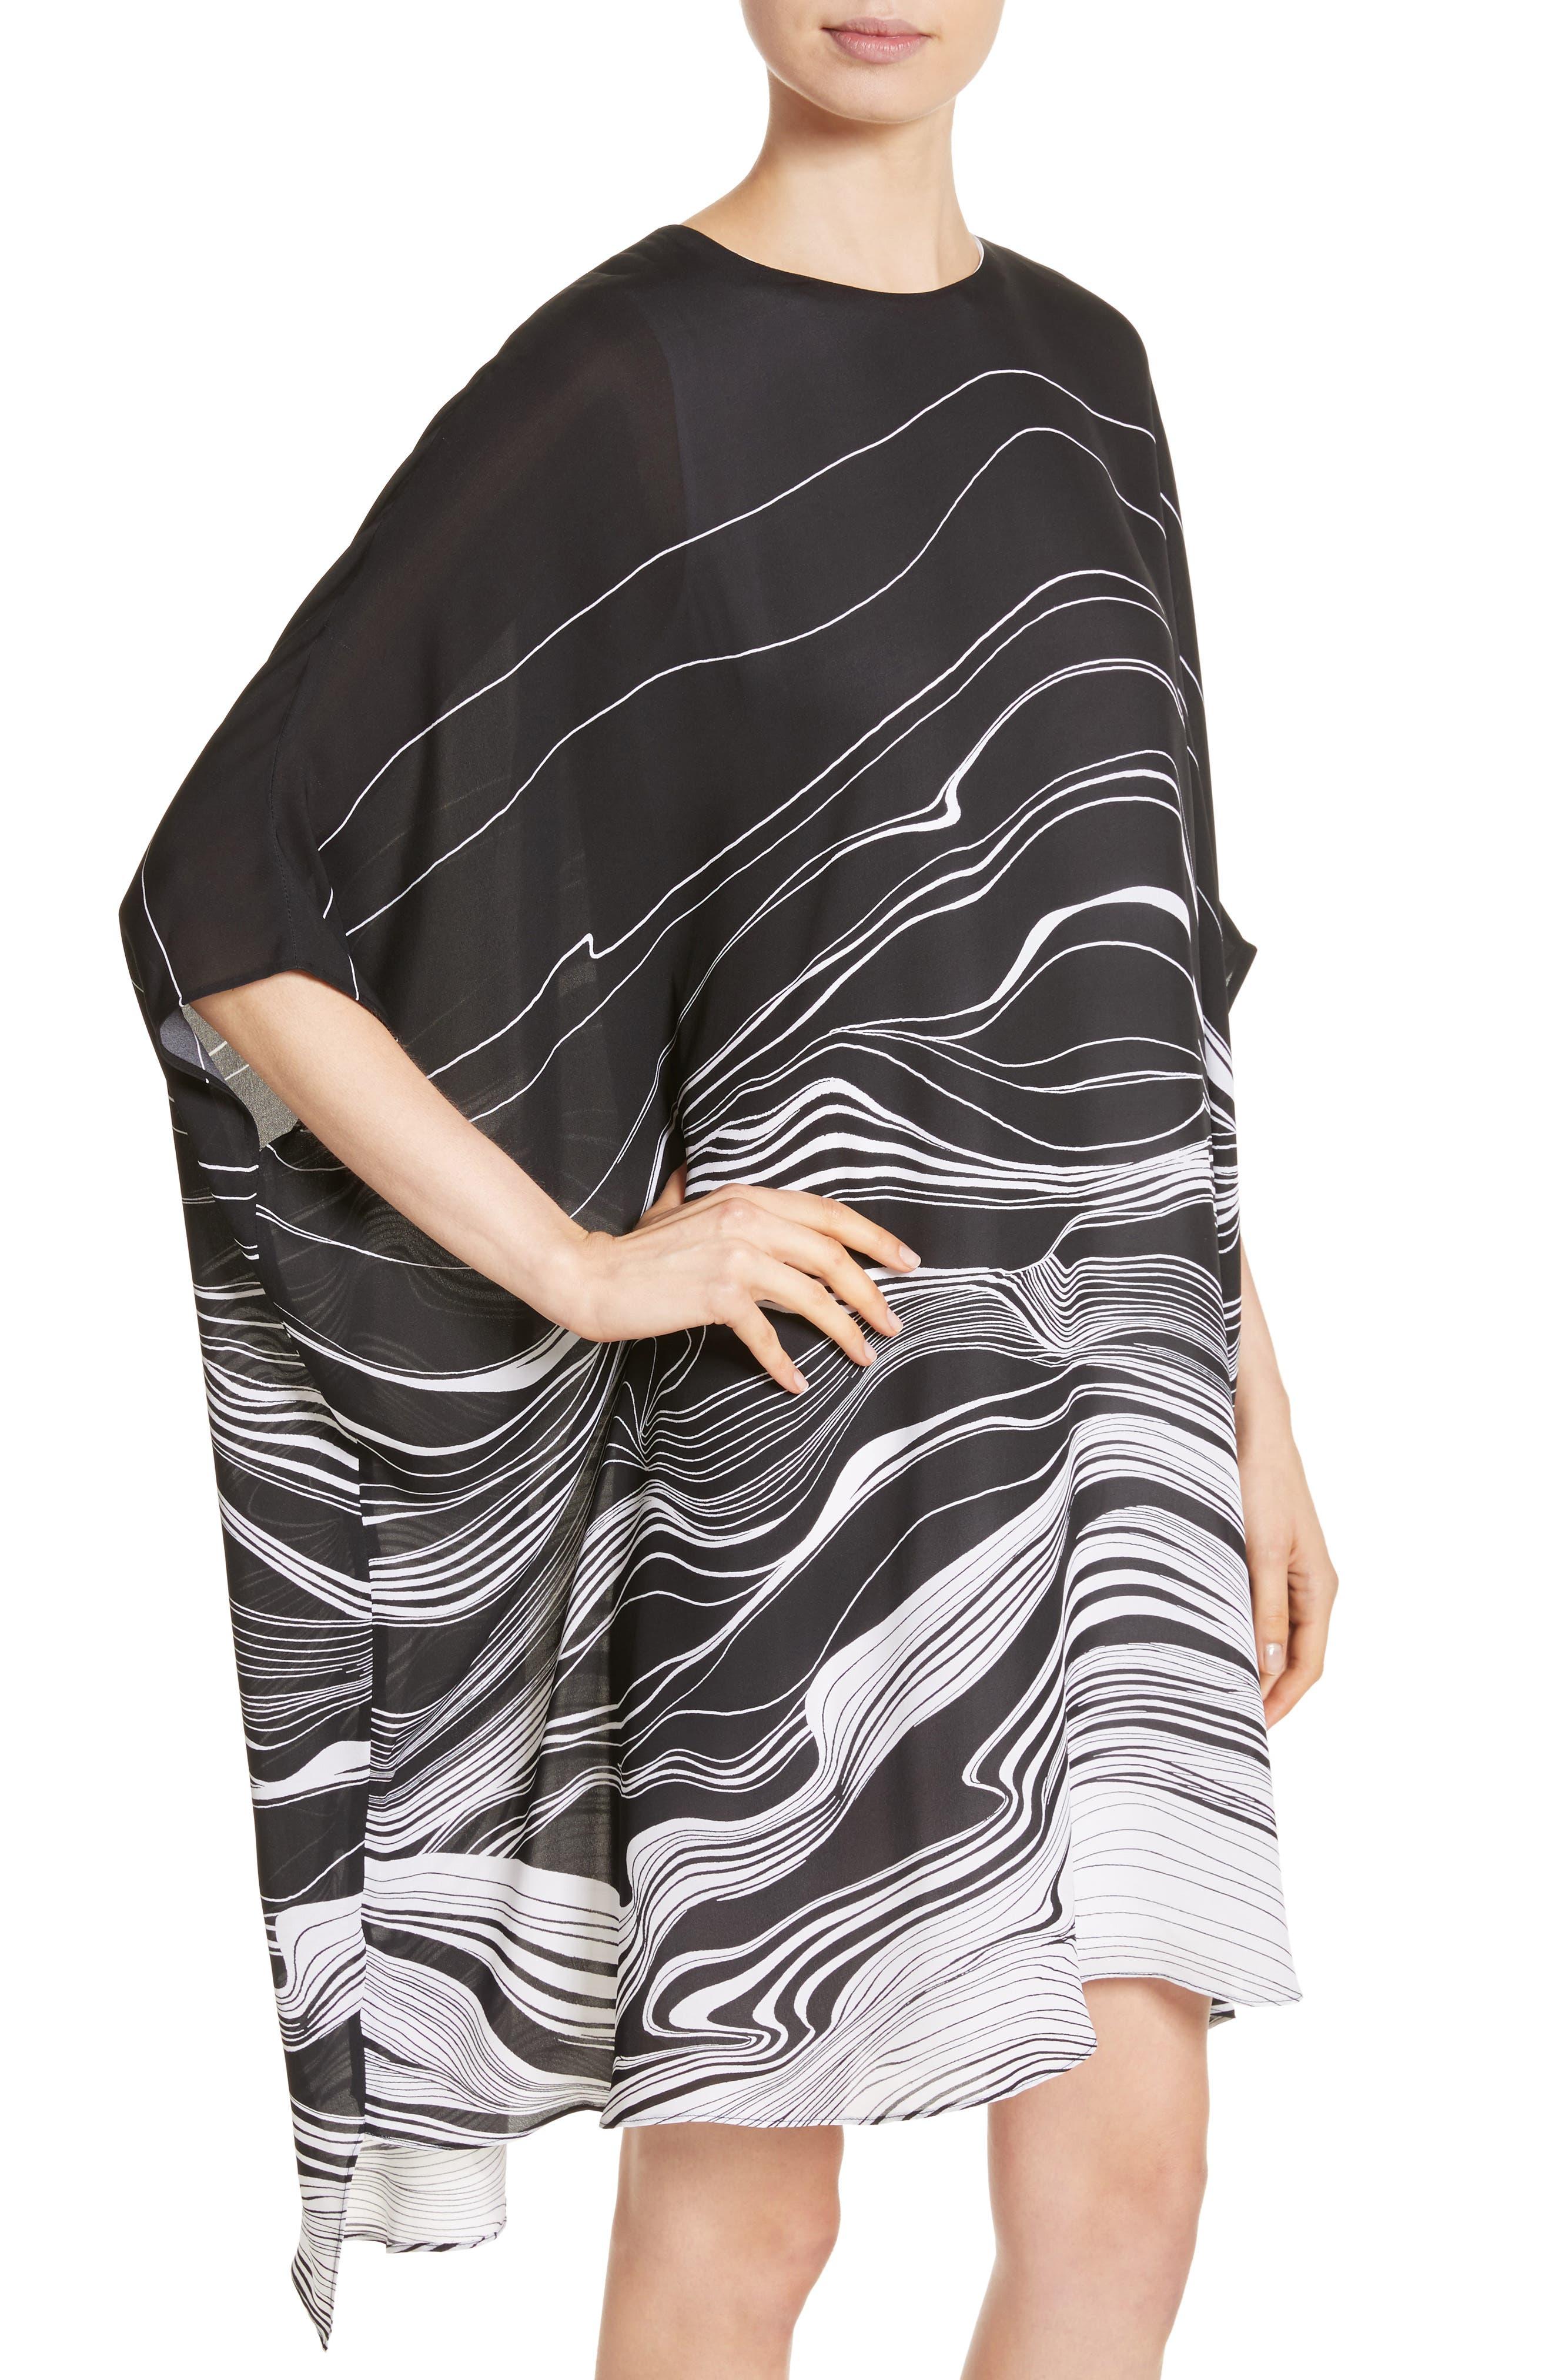 Brushstroke Print Silk Satin Dress,                             Alternate thumbnail 4, color,                             Caviar/ Bianco